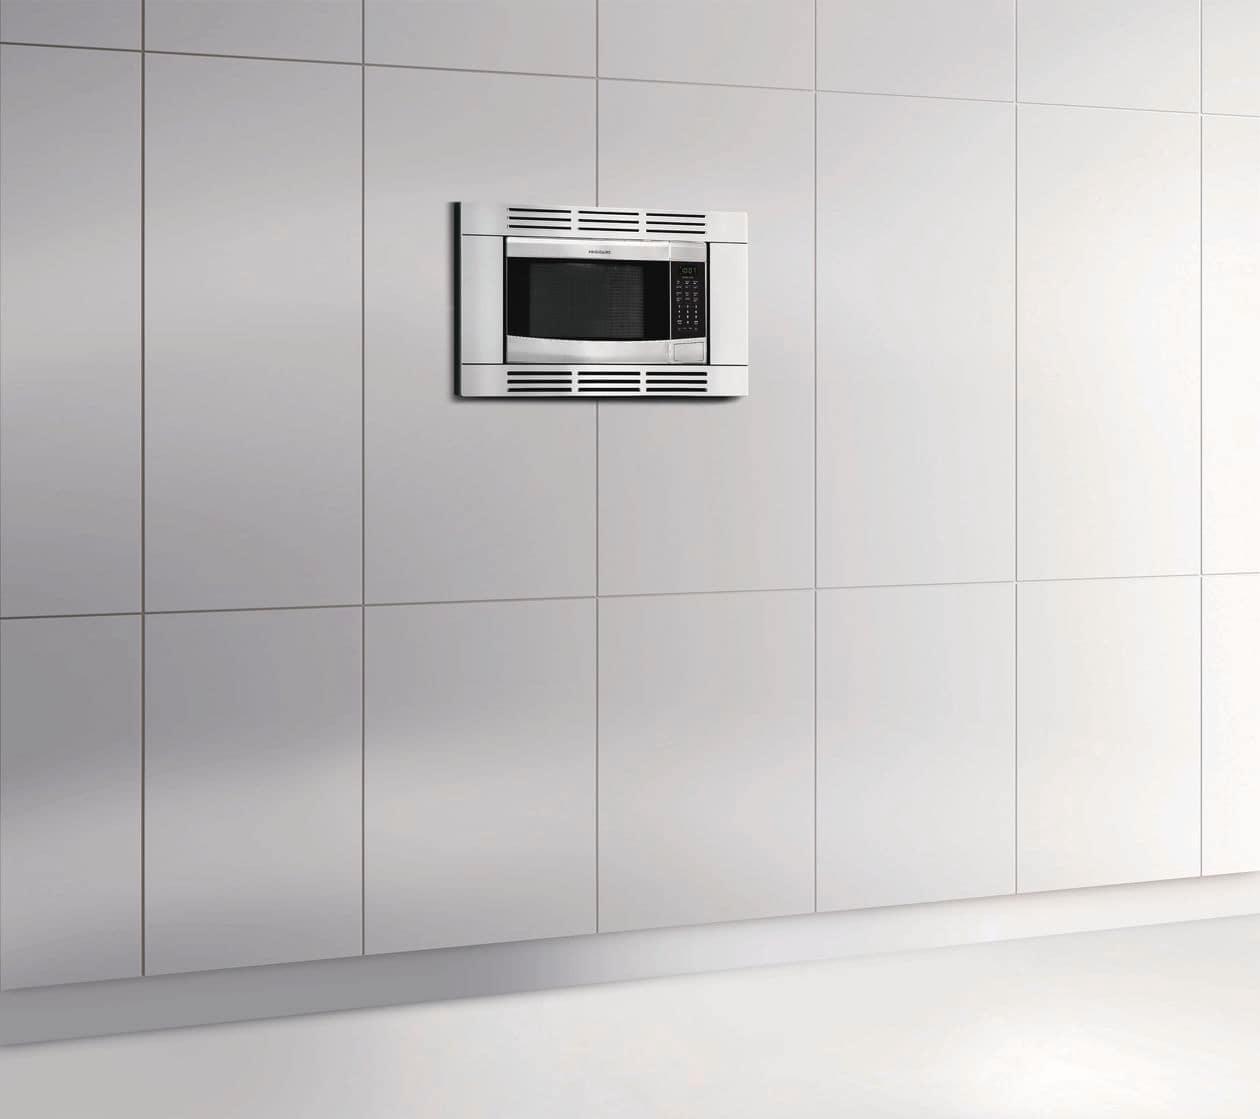 Model: FFMO1611LS | Frigidaire 1.6 Cu. Ft. Built-in Microwave